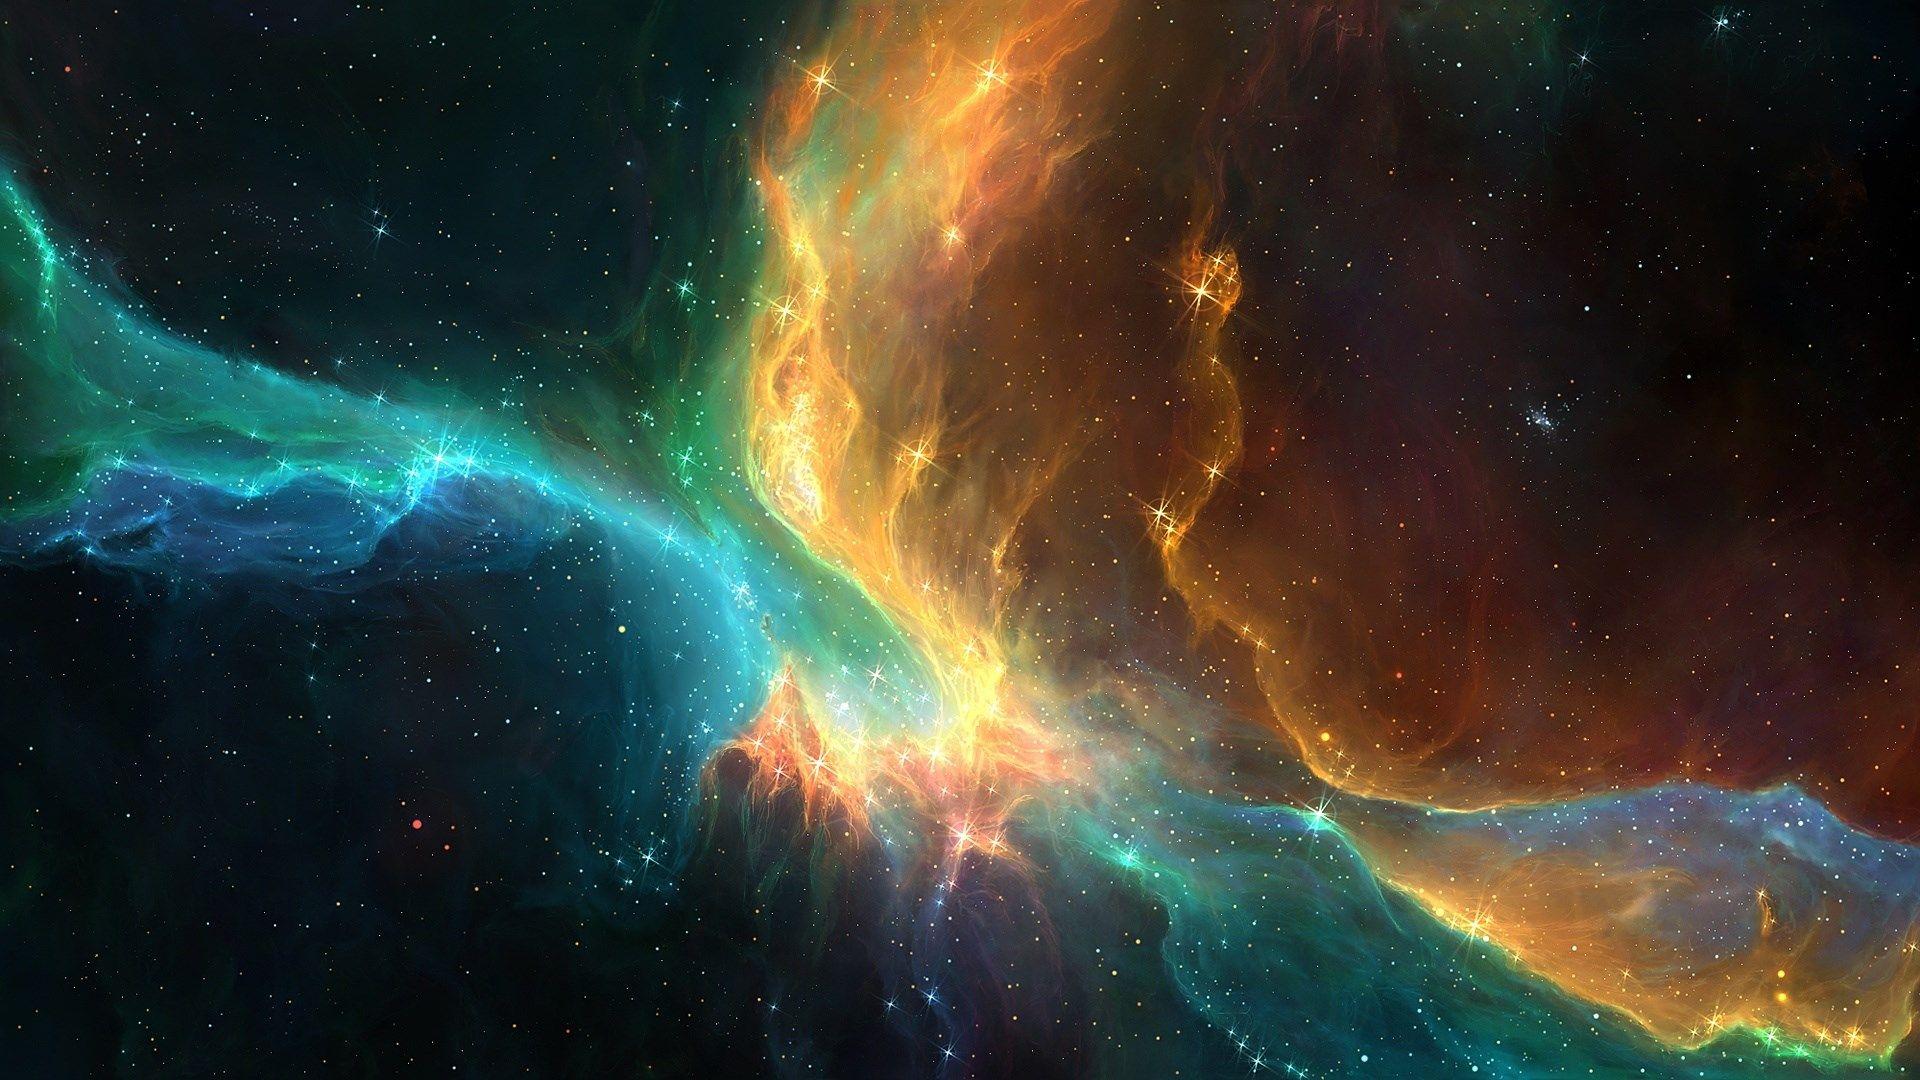 Space Free Desktop Wallpaper Nebula Wallpaper Space Art Wallpaper Nebula